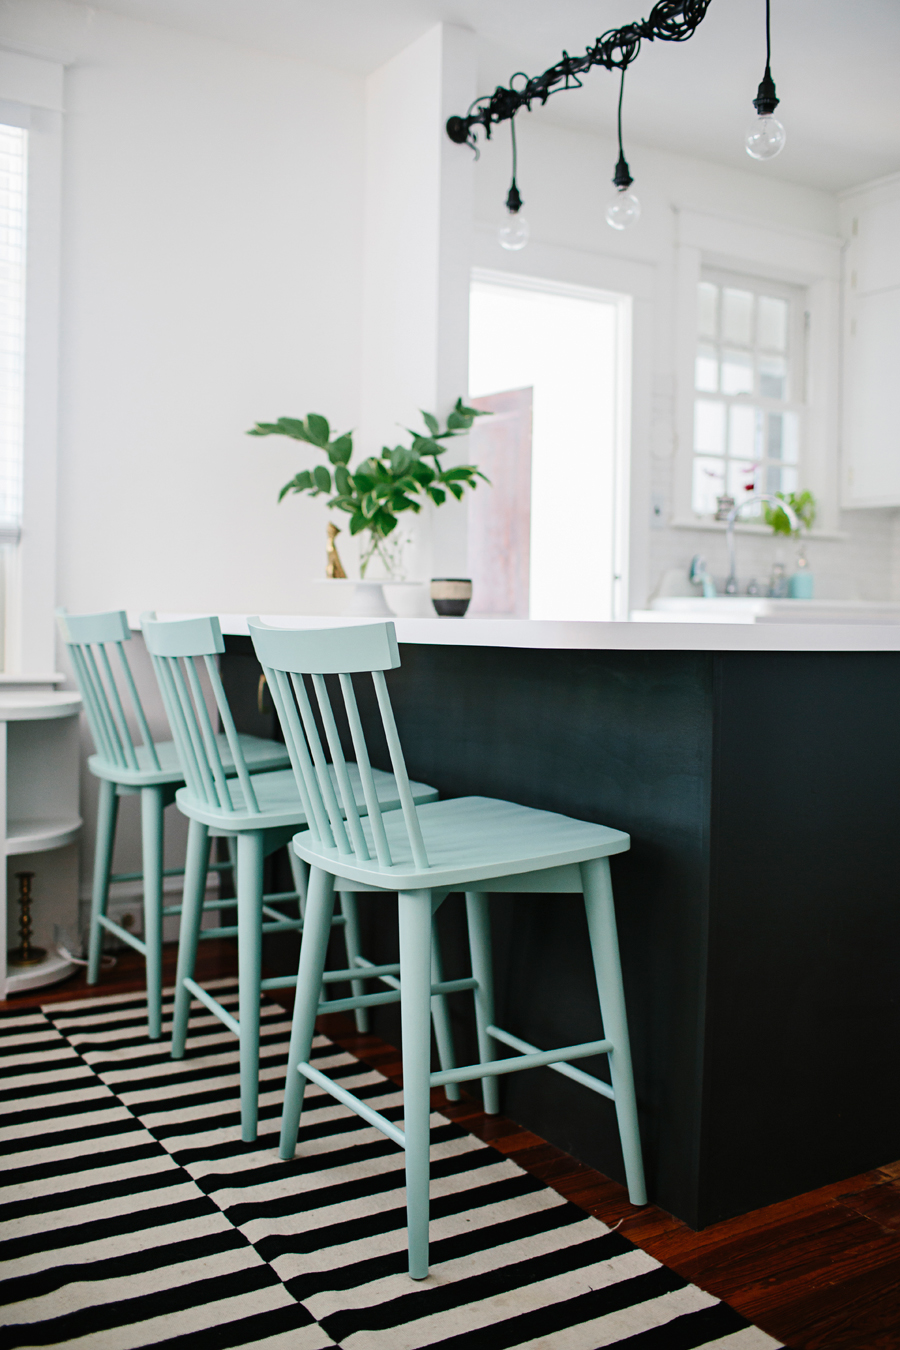 kitchen_beforeandprogress-2.jpg